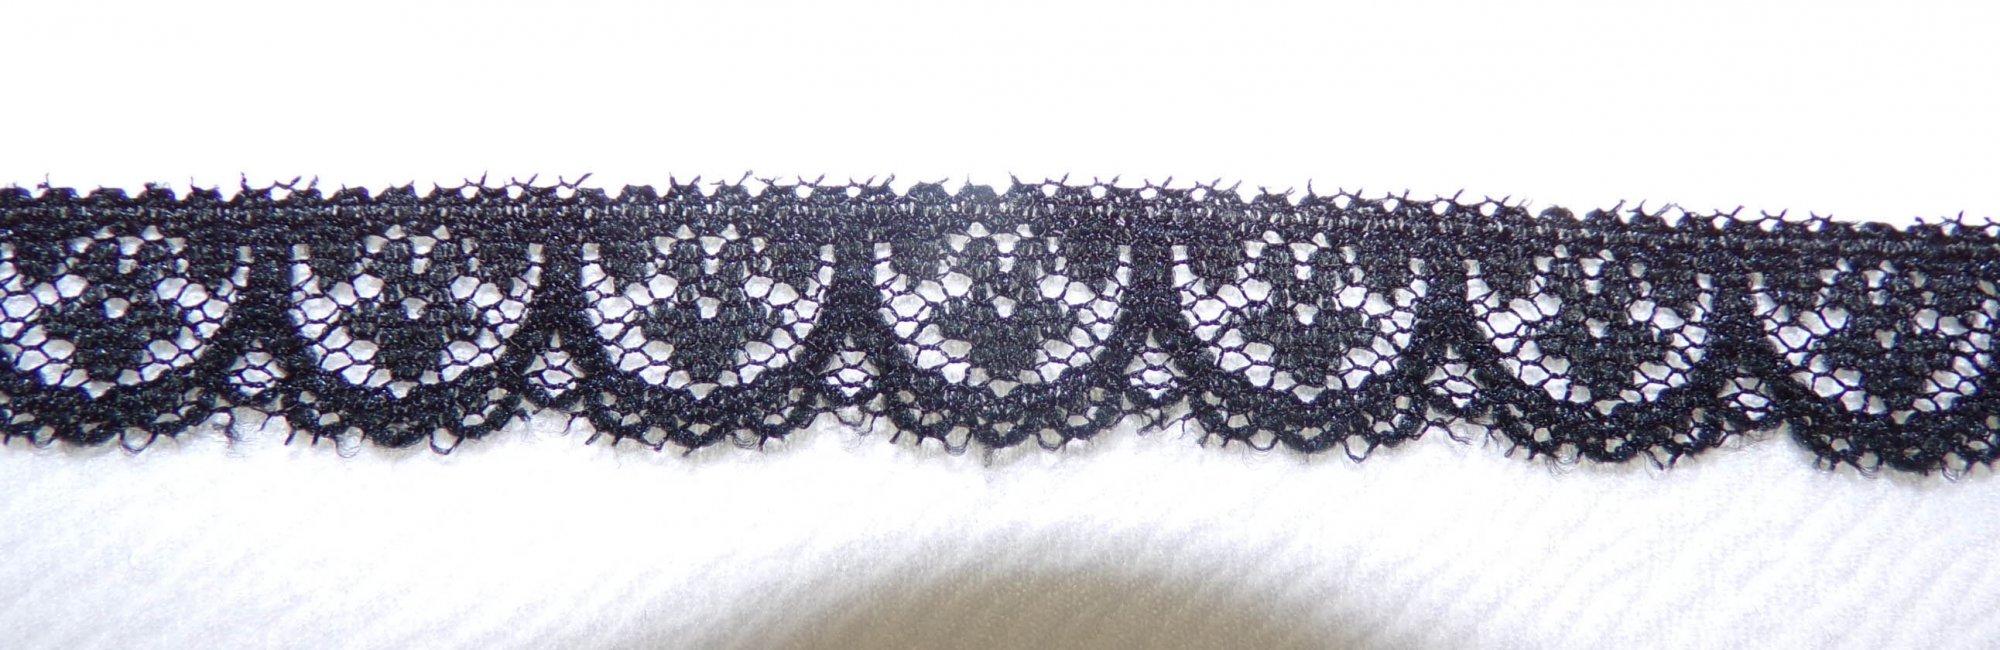 1/2 Black Rigid Lace (654461)